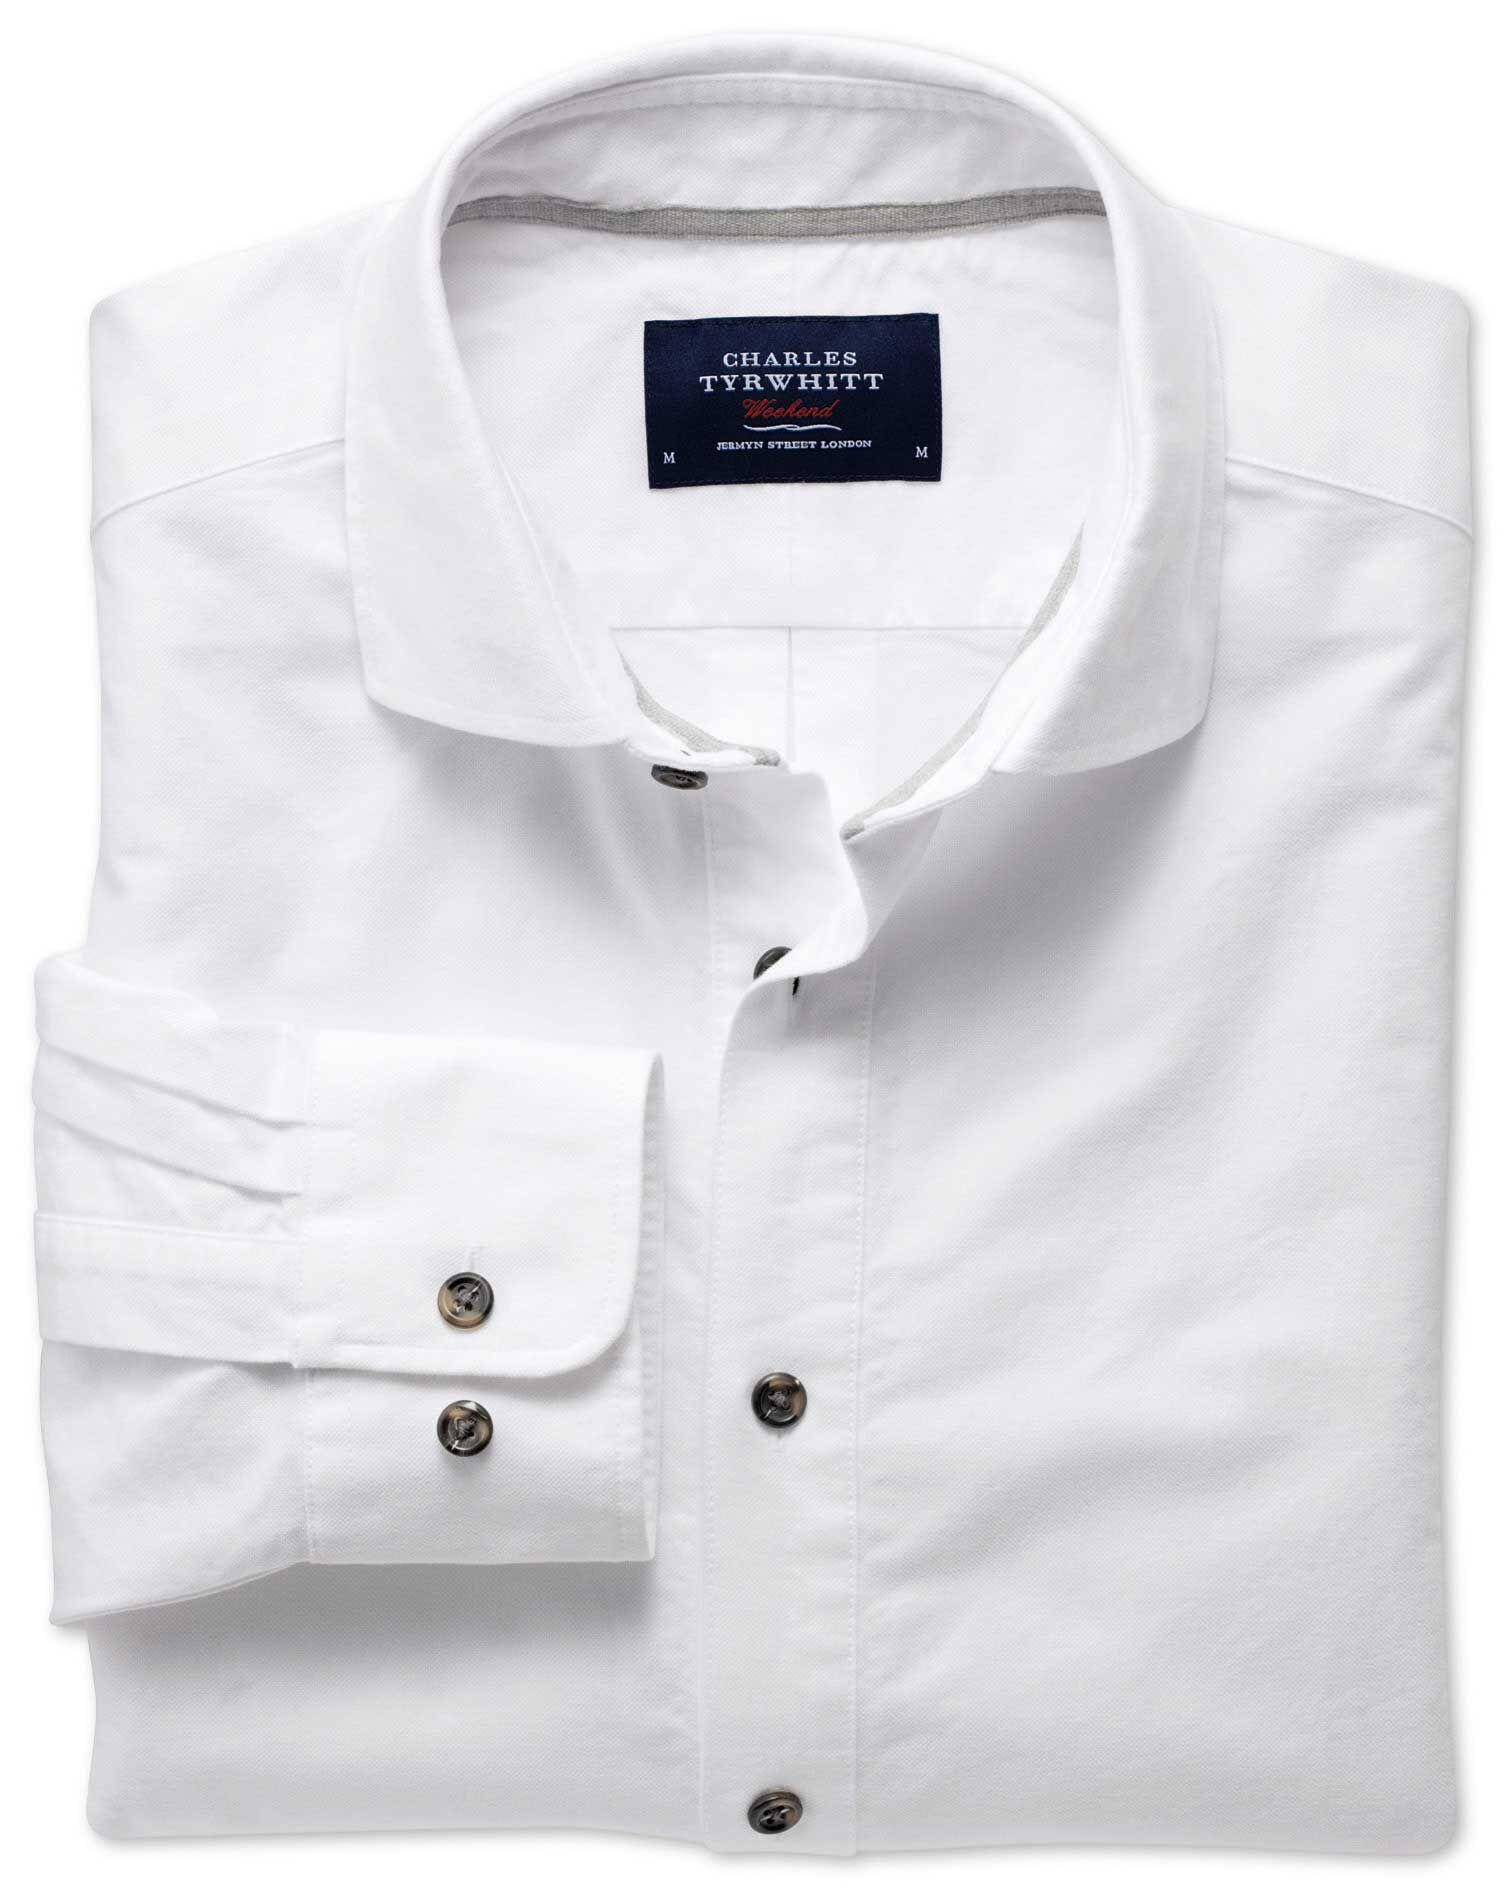 Slim Fit Cutaway Collar Popover White Cotton Shirt Single Cuff Size XS by Charles Tyrwhitt